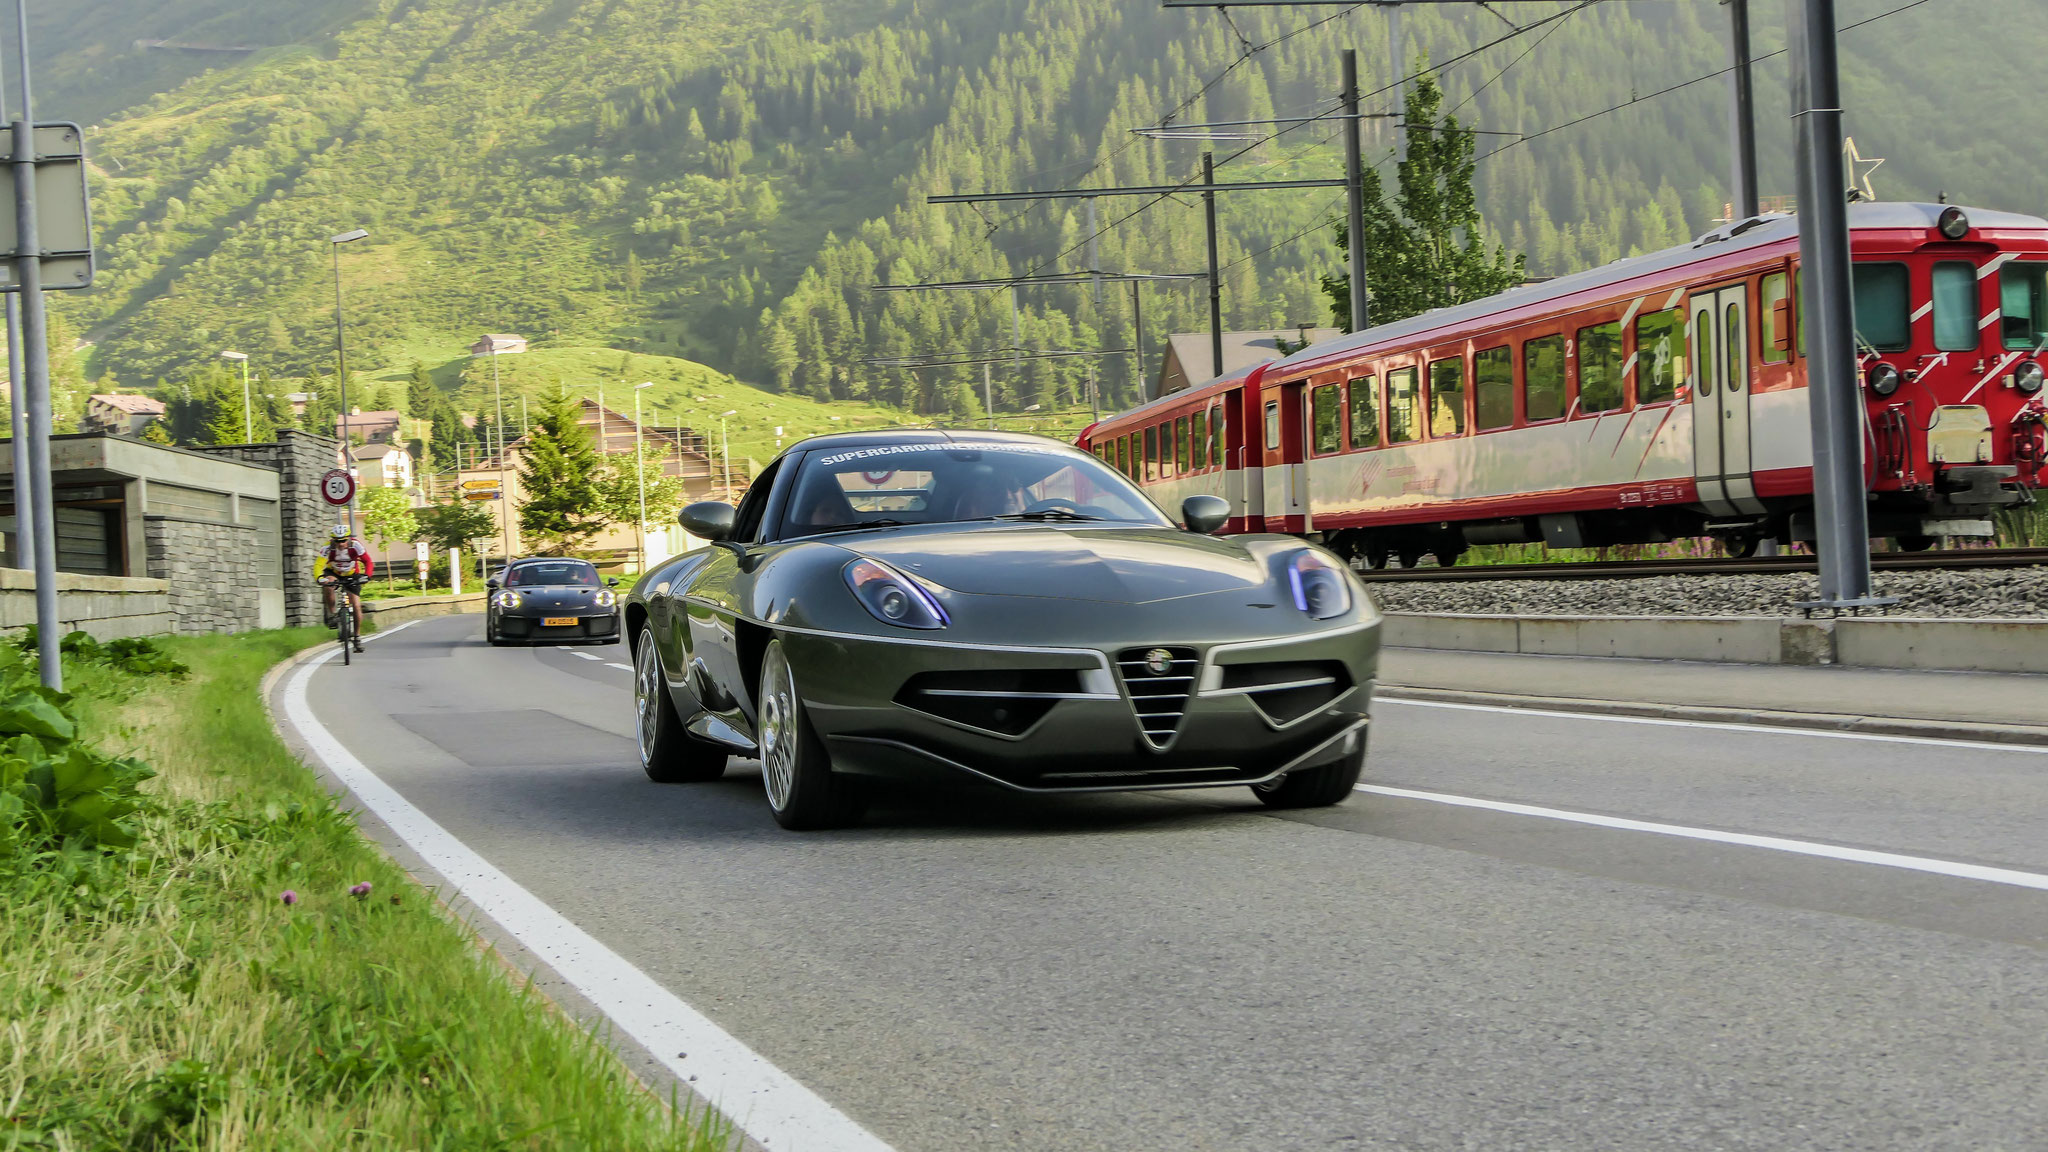 Touring Superleggera Alfa Romeo Disco Volante - EV-886-VW-75 (FRA)